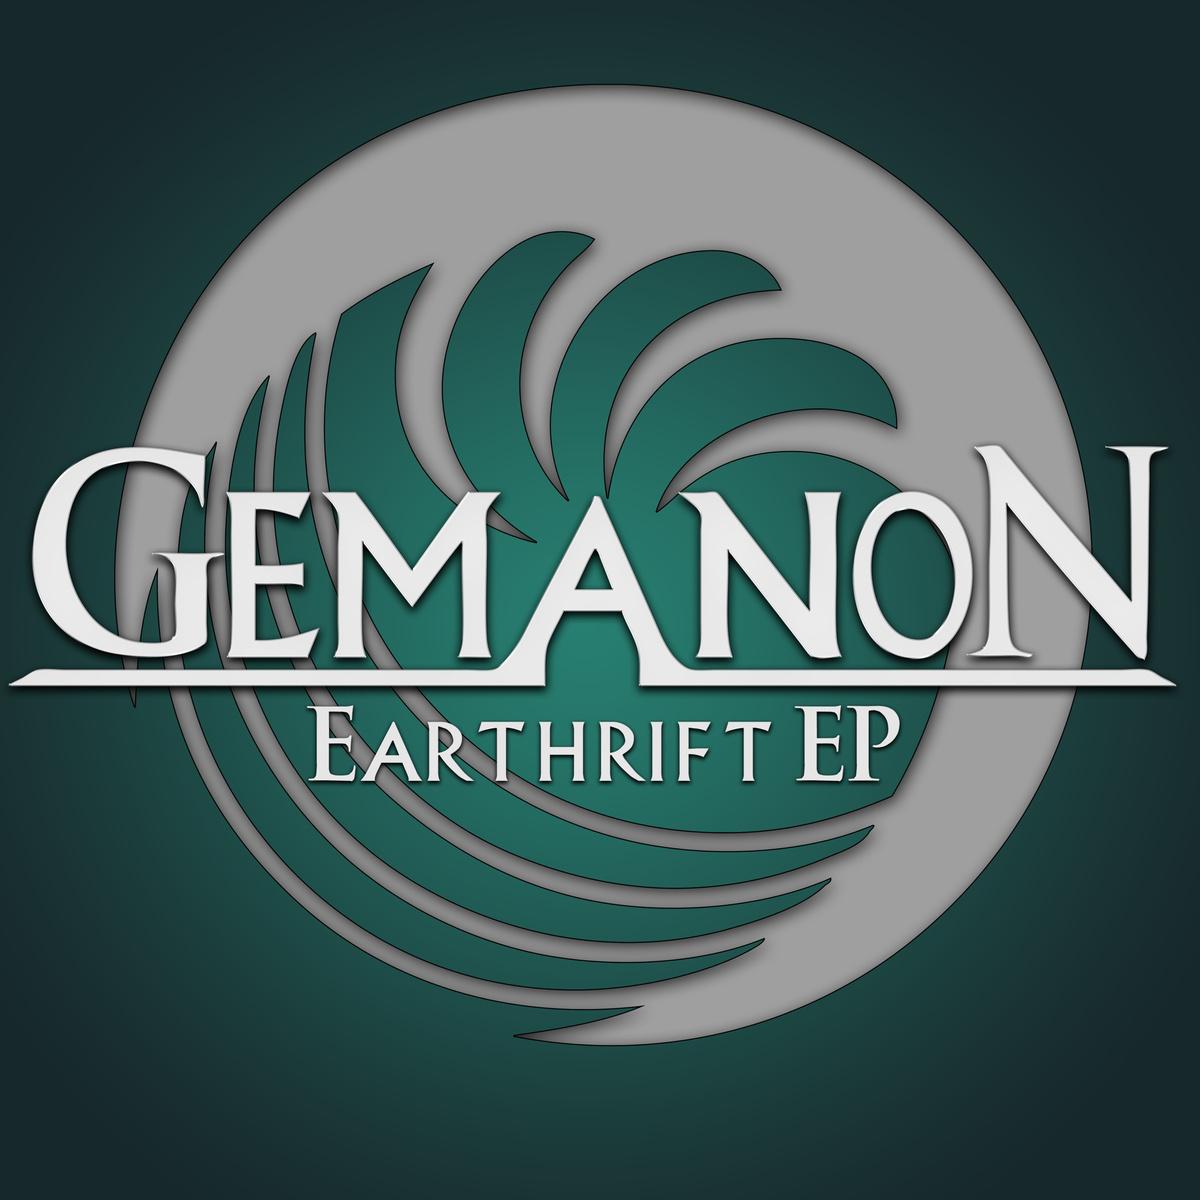 Gemanon-Earthrift-EP